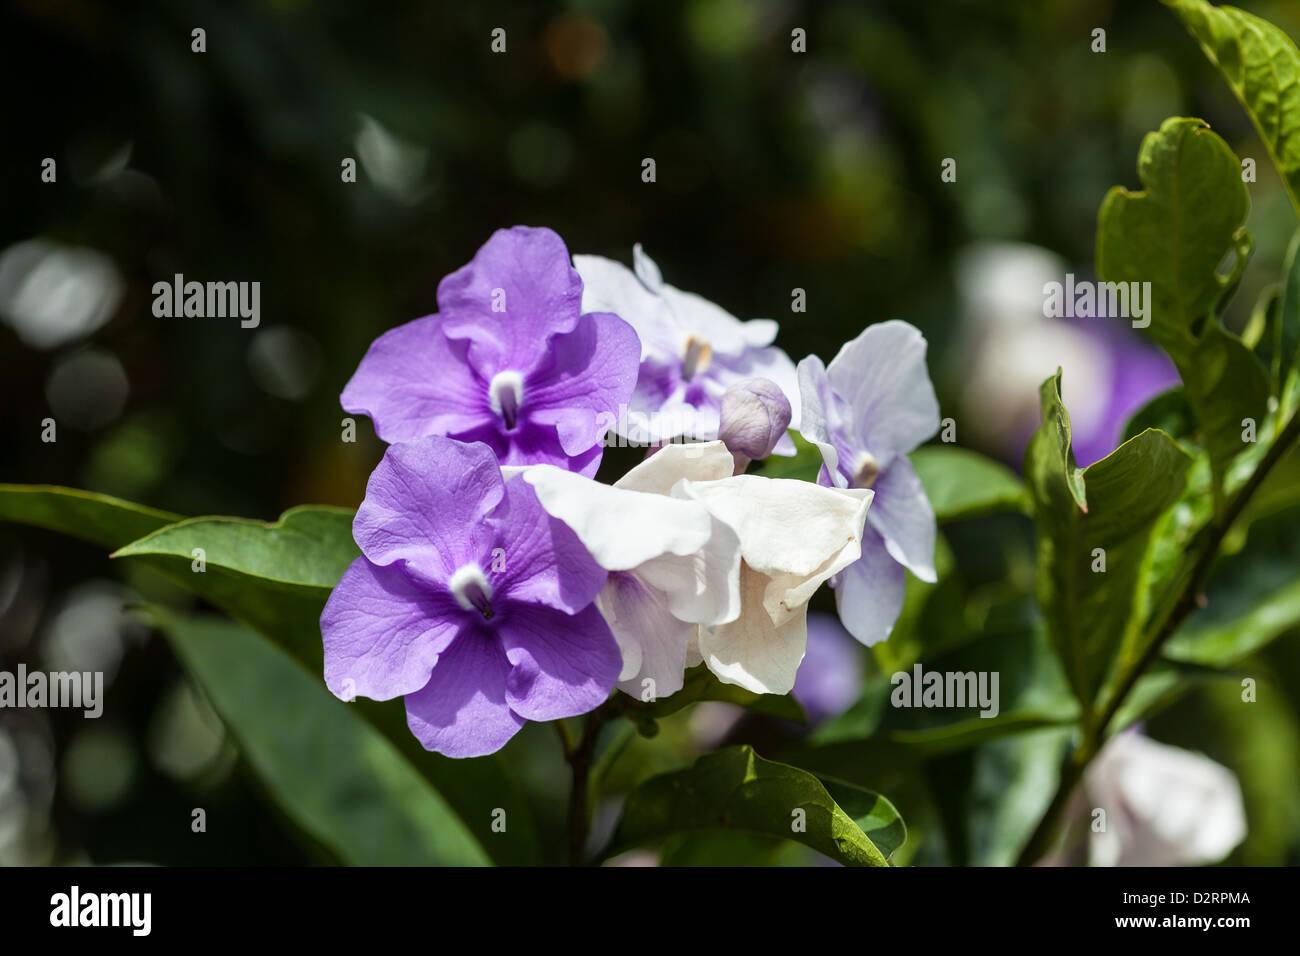 Pretty Purple And White Flowering Bush Stock Photo 53383130 Alamy